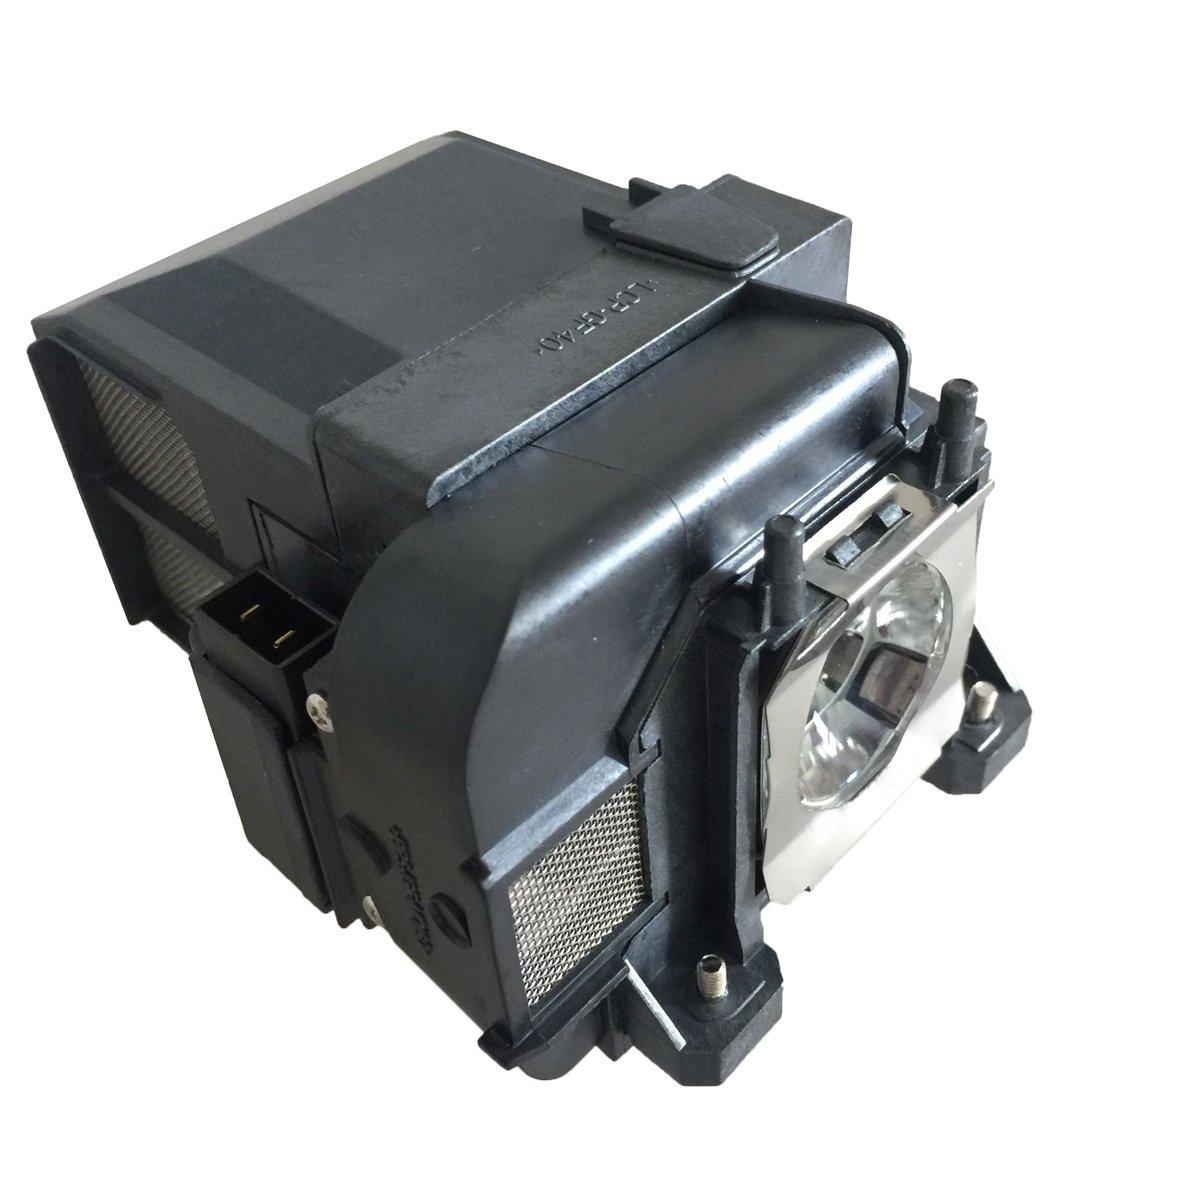 Epson Projector Remote Control PowerLite 1940W 1965 1960 1955 1950 EB-1955 1945W